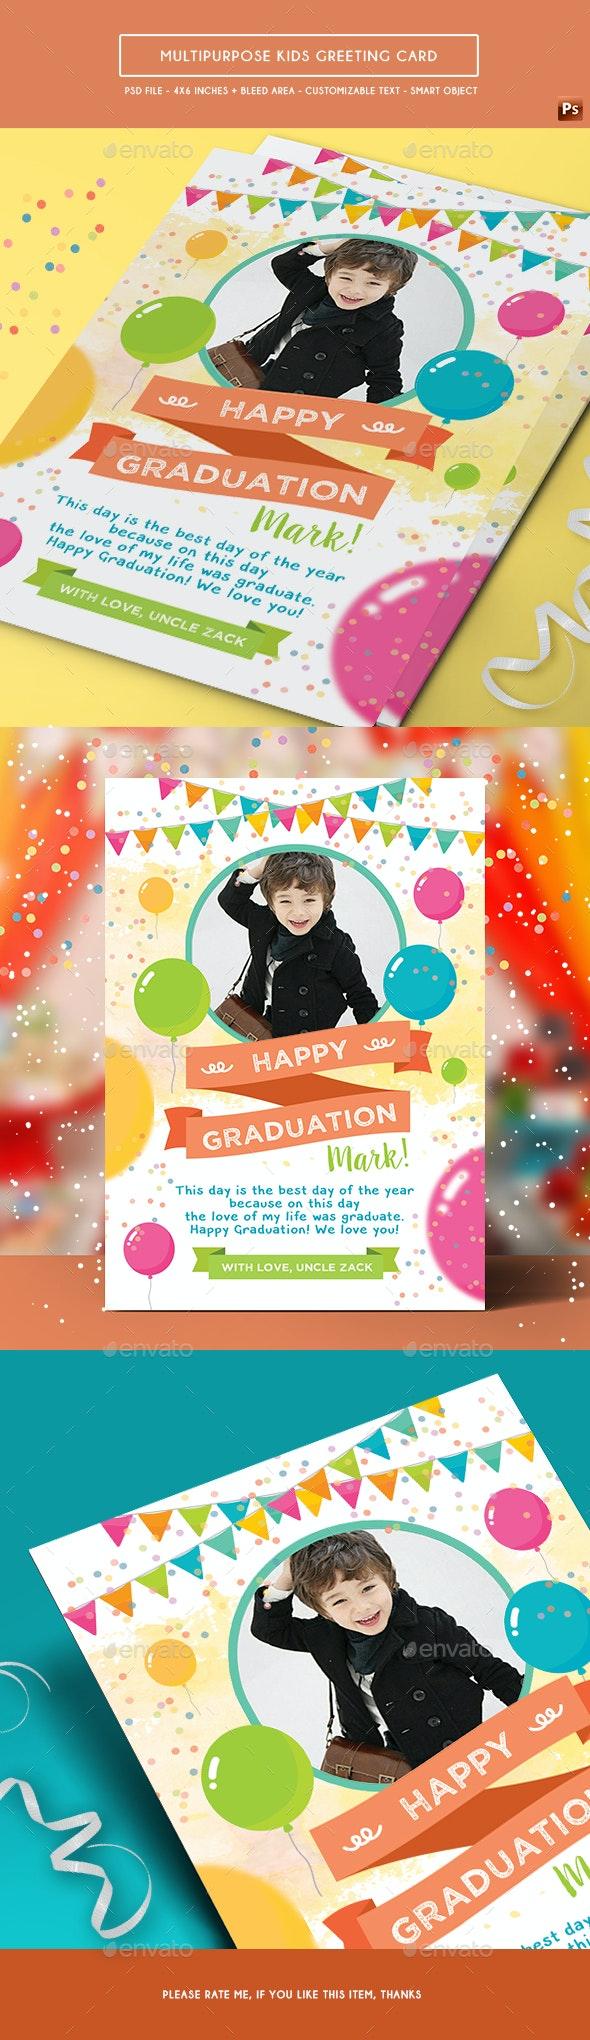 Multipurpose Kids Greeting Card - Birthday Greeting Cards